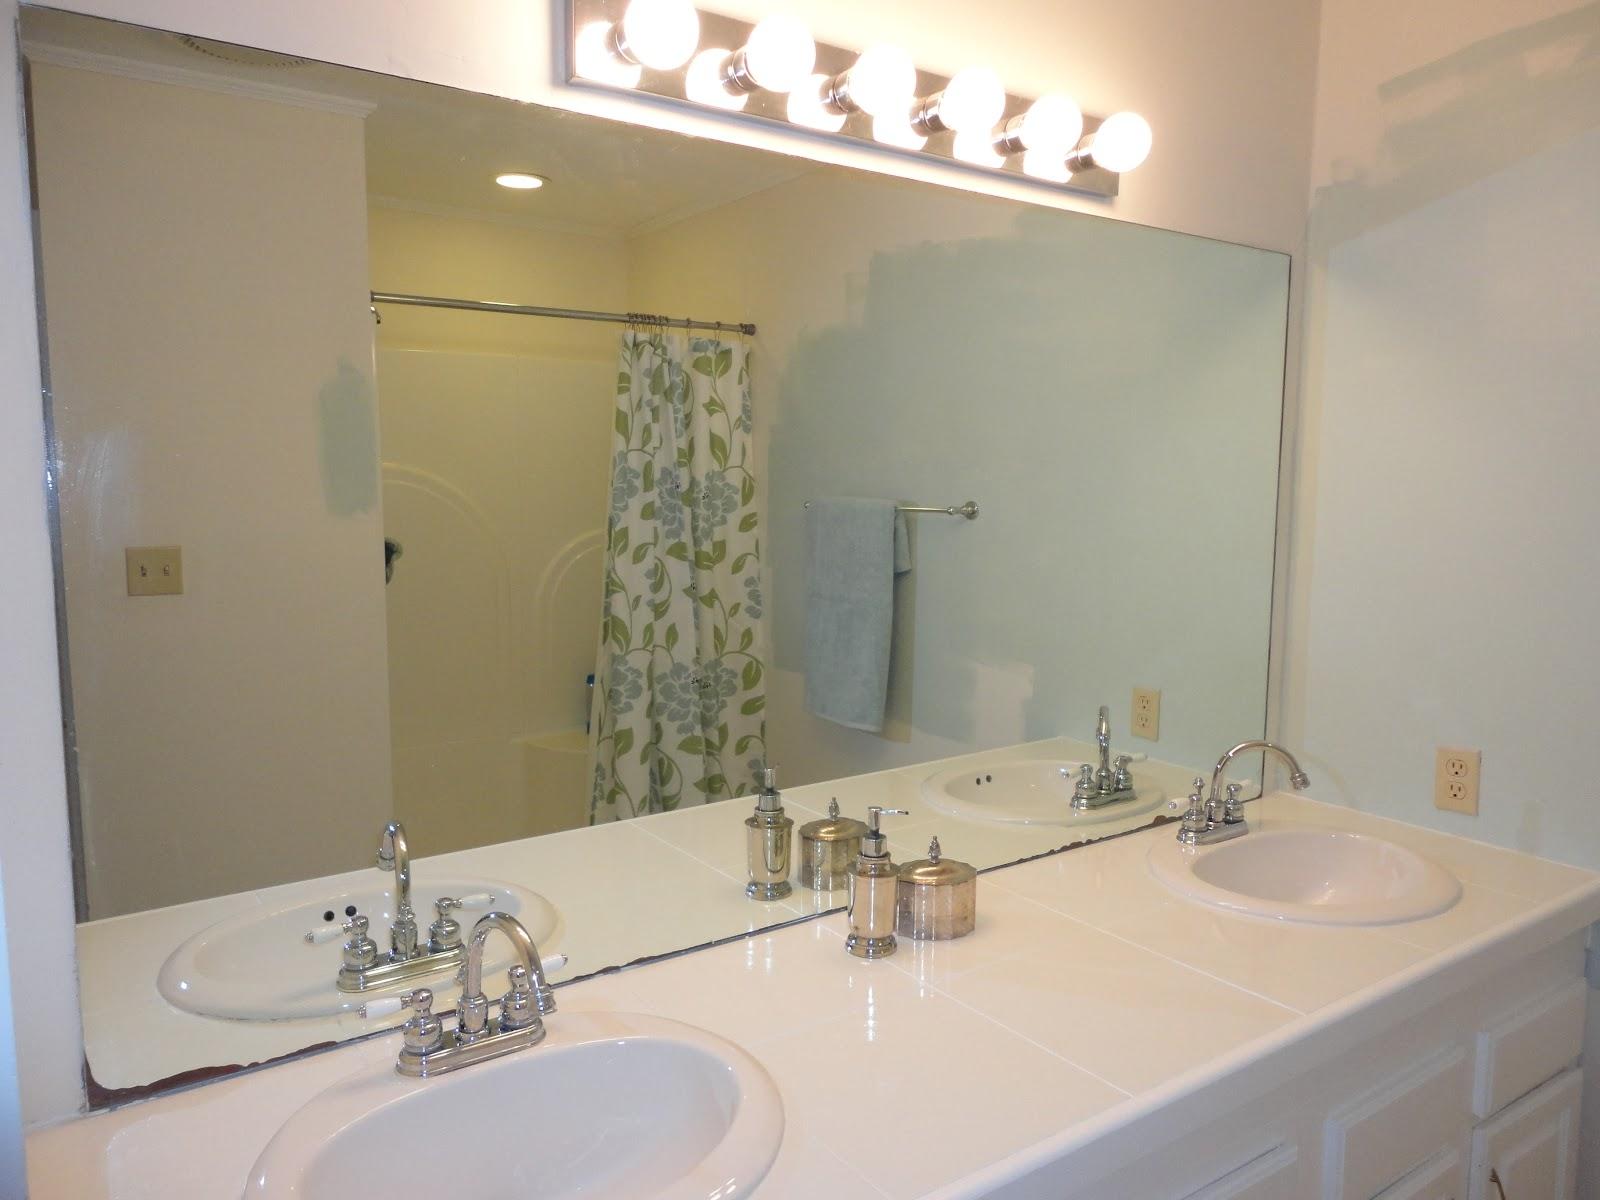 Tile Trim Around Bathroom Mirror